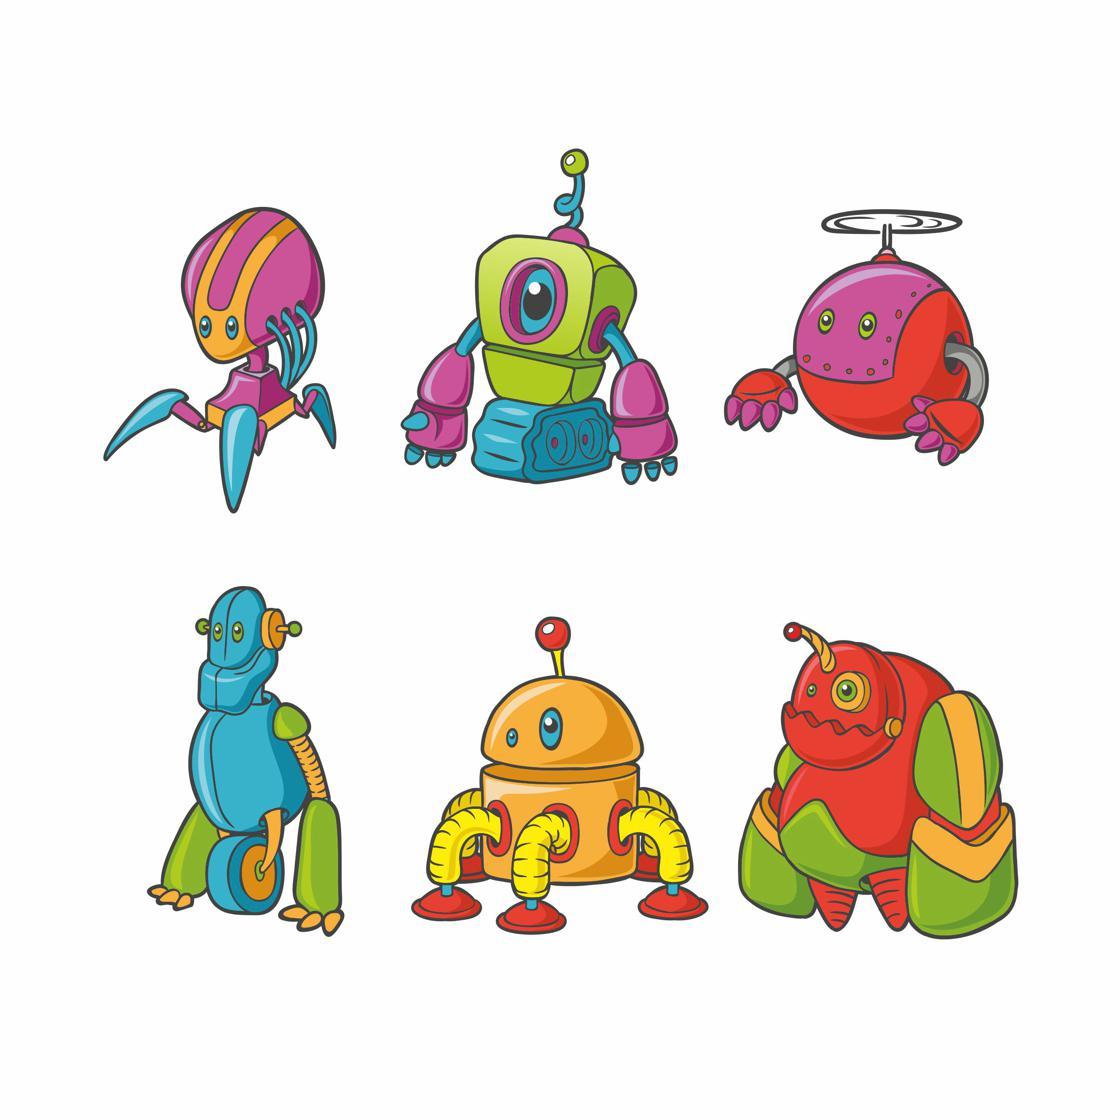 illustration designed by annasmoke